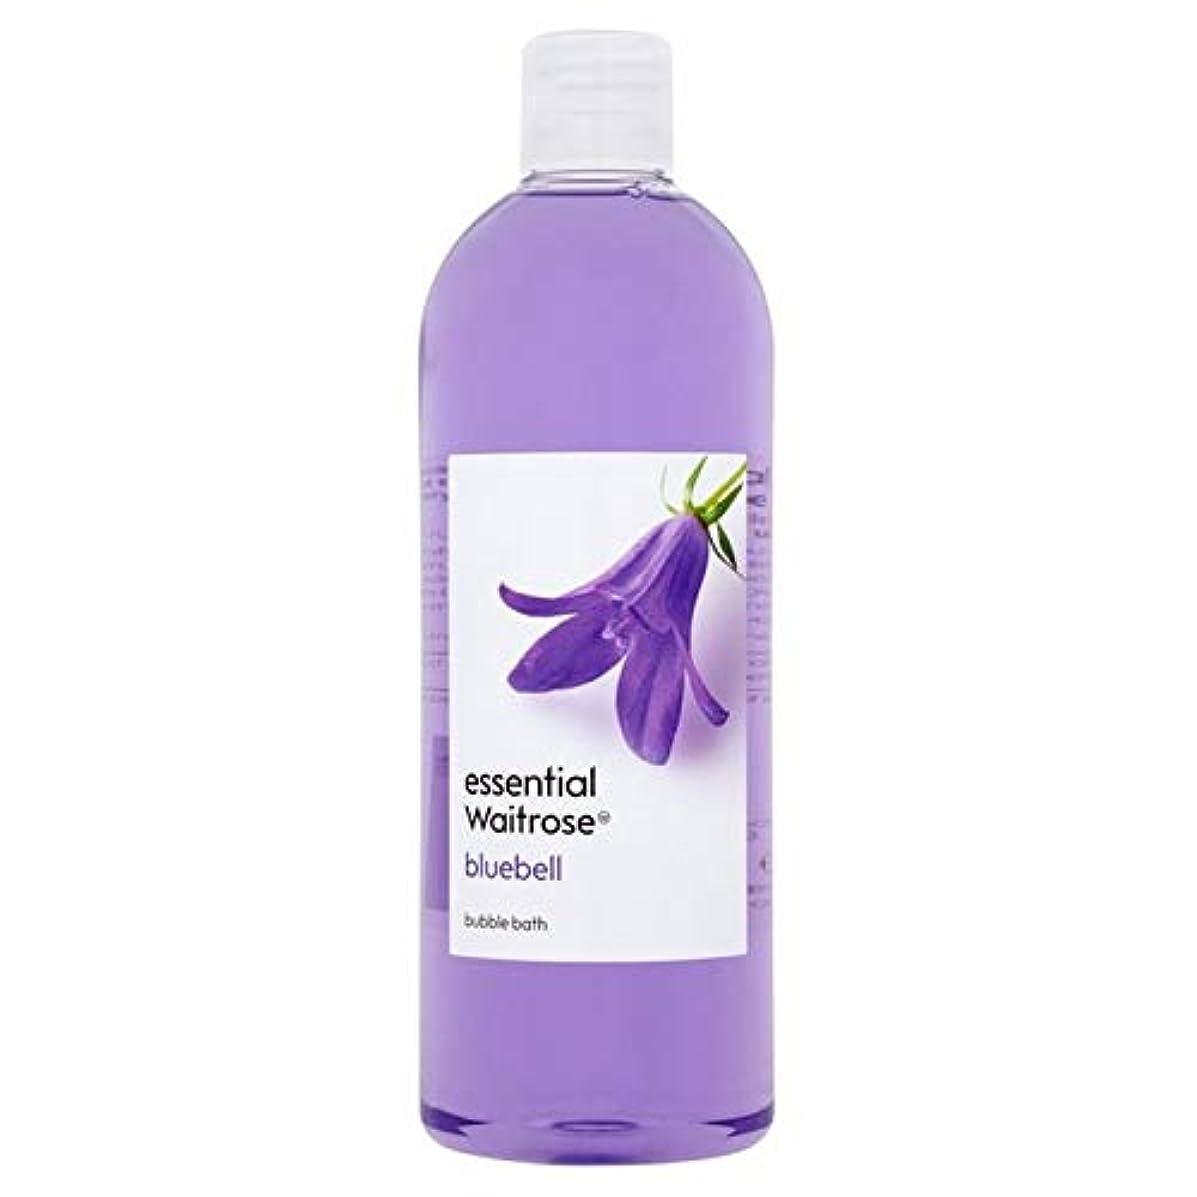 [Waitrose ] 基本的なウェイトローズの泡風呂ブルーベル750ミリリットル - Essential Waitrose Bubble Bath Bluebell 750ml [並行輸入品]